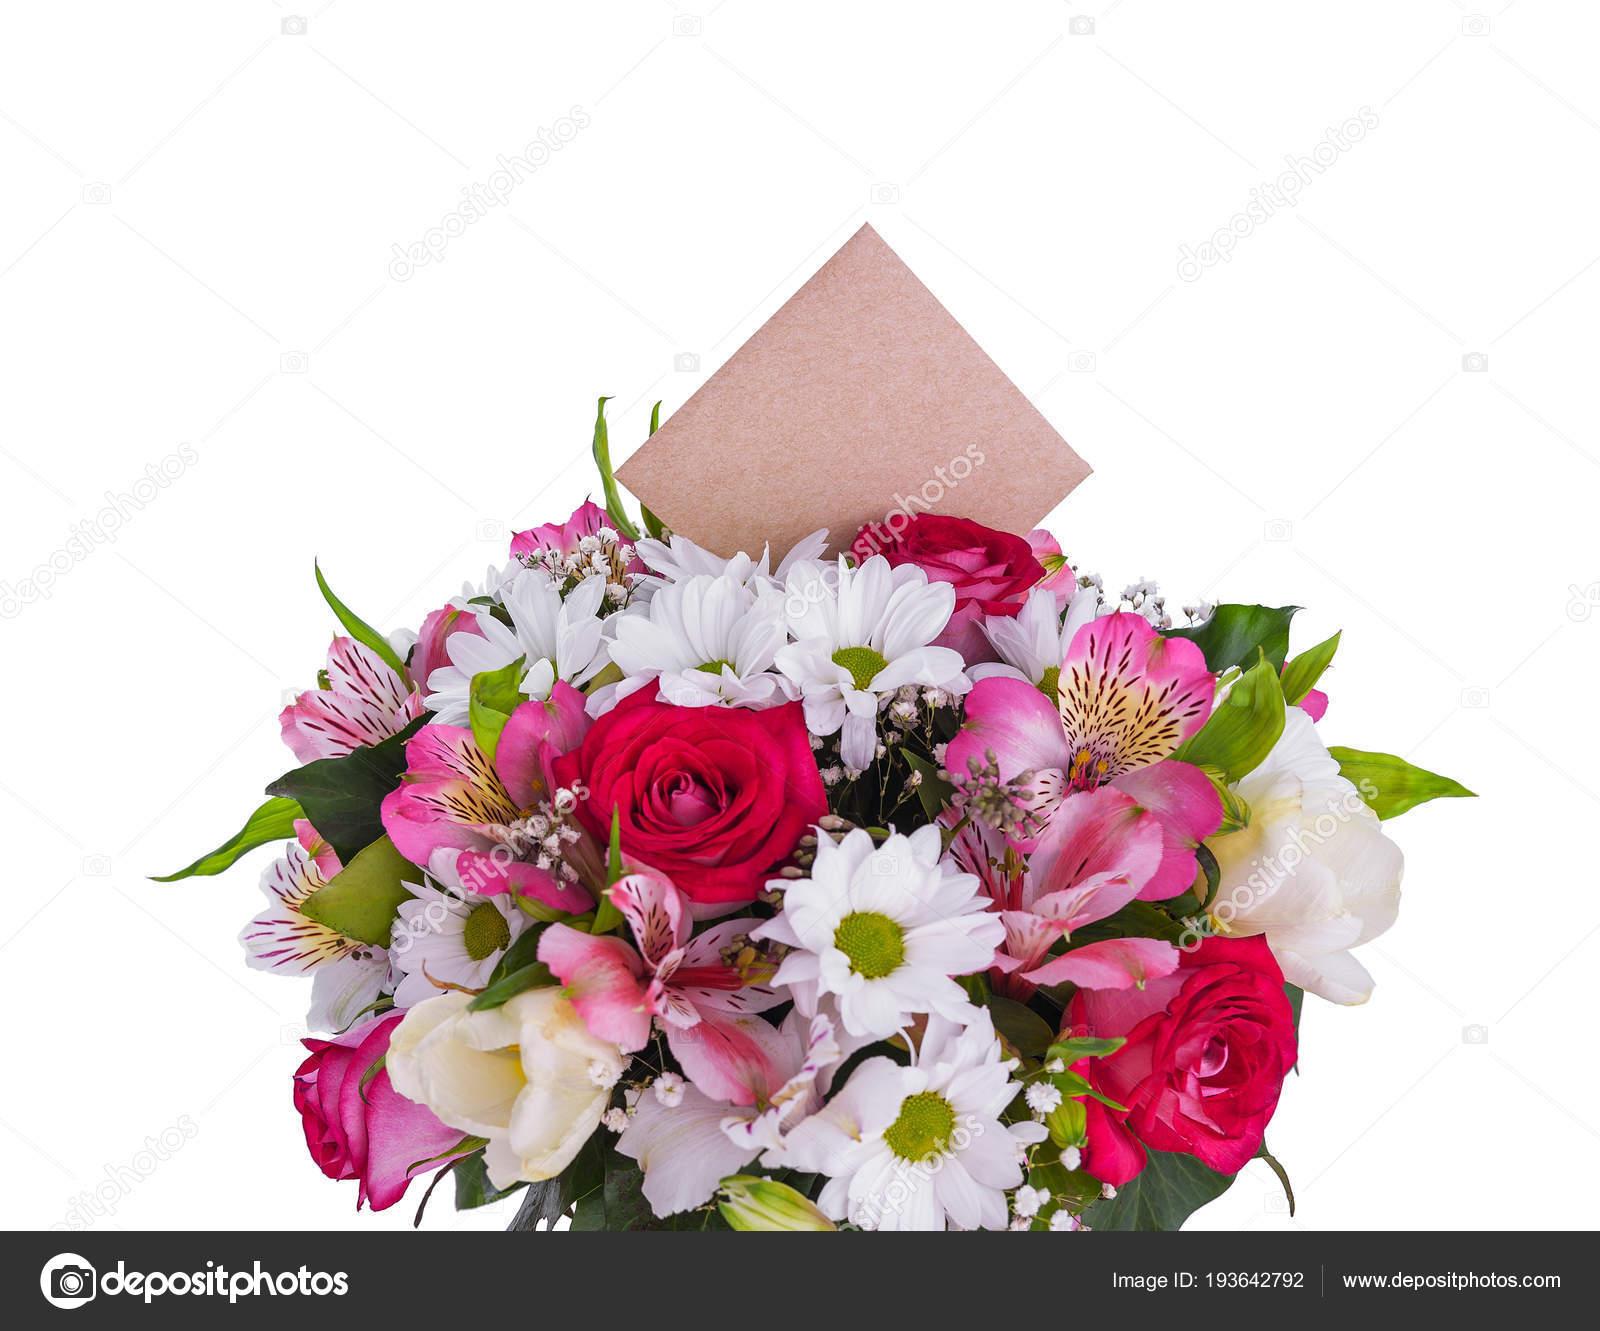 Mazzo Di Fiori Auguri.Bouquet Of Flowers With A Greeting Card Stock Photo C Tanya